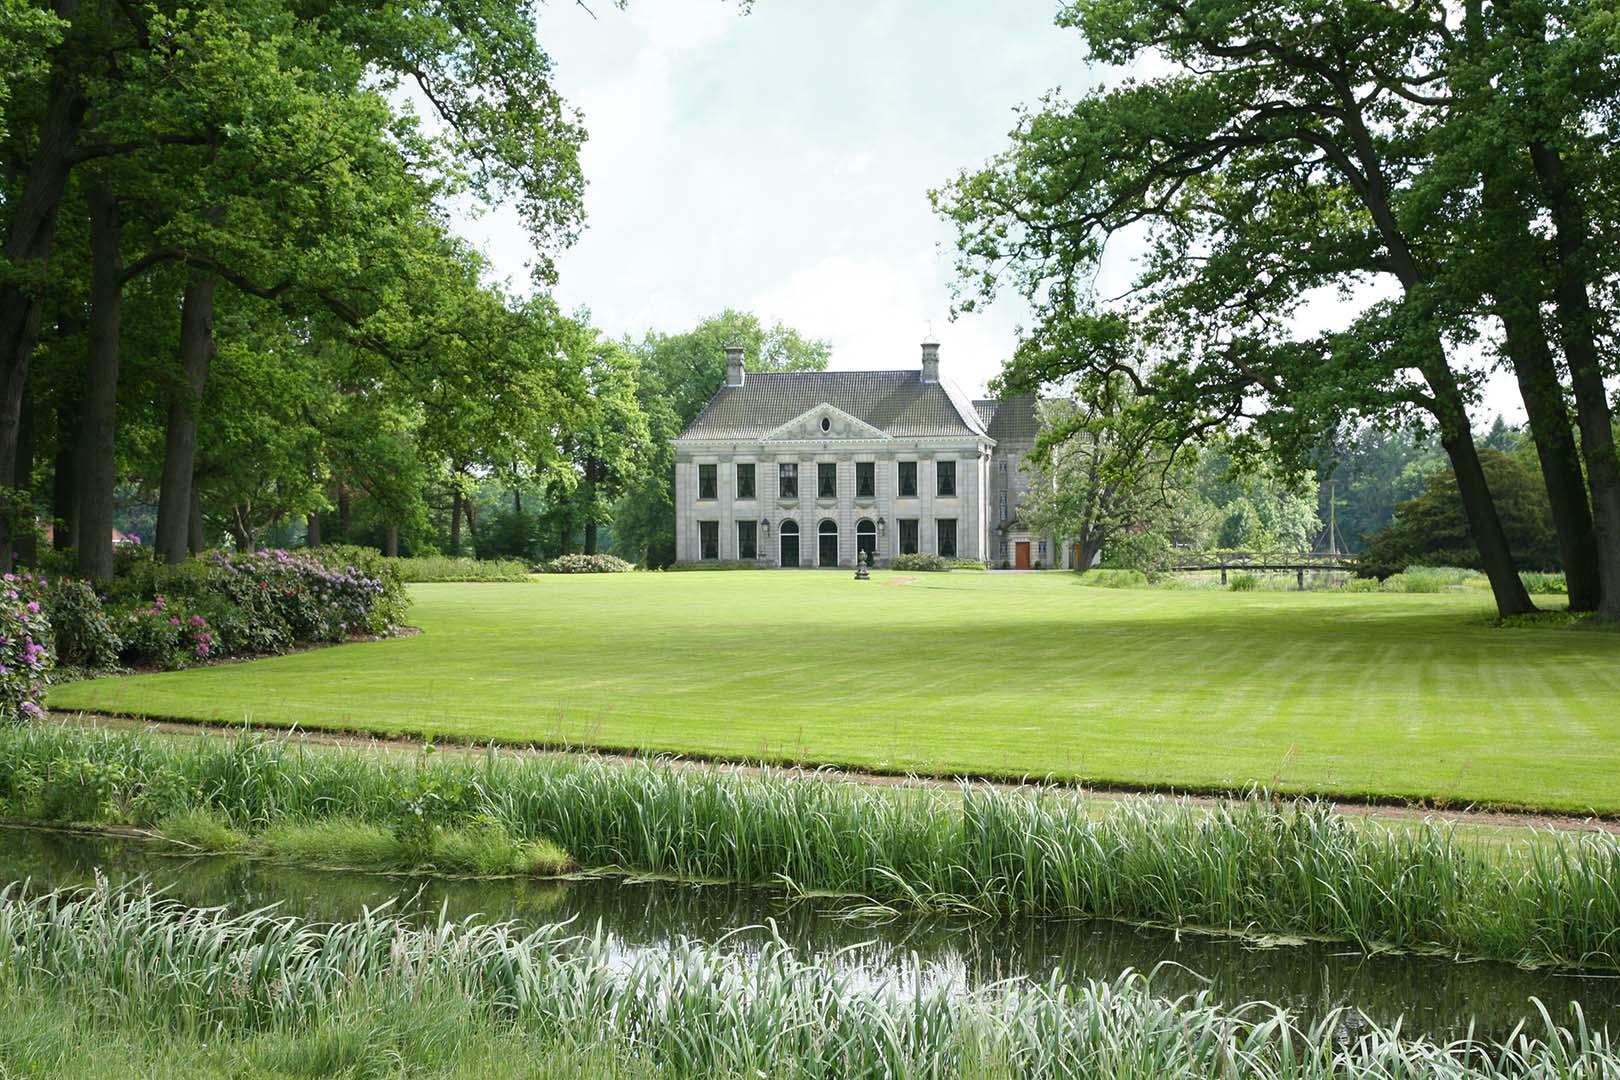 Landhuishotel De Bloemenbeek, Taste the Indian Summer in Twente, Discover Benelux magazine